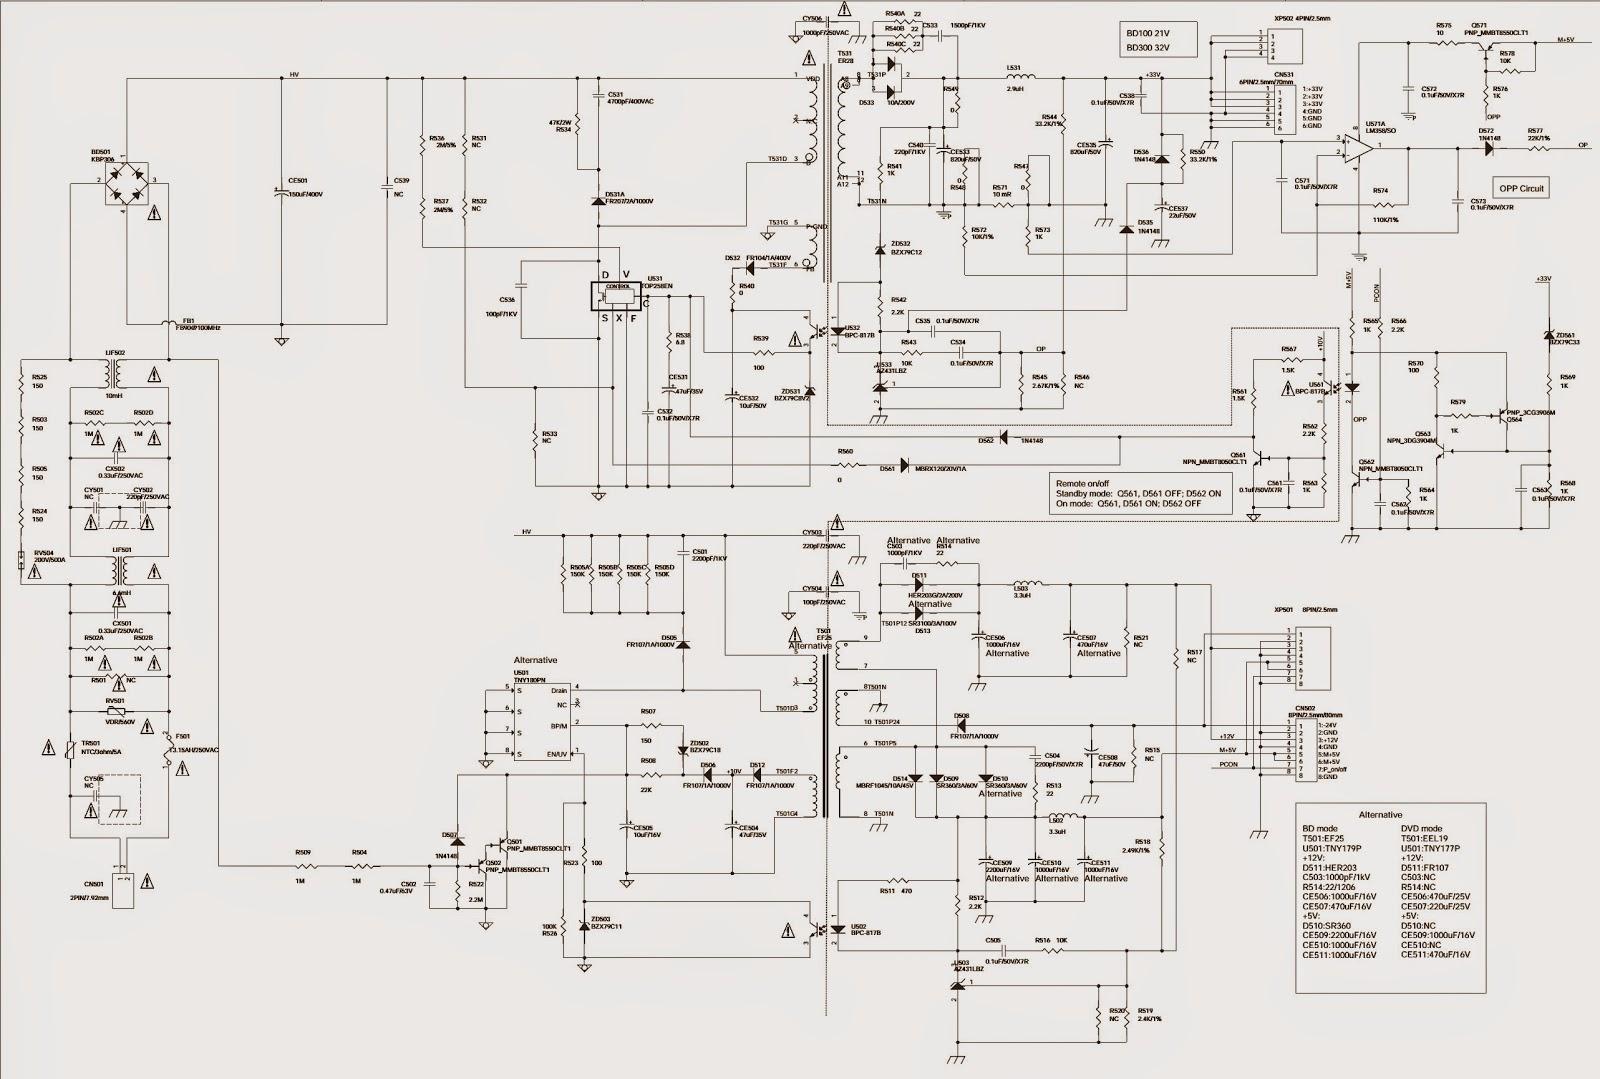 Jbl Mr16 Wiring Diagram Jbl Mr Wiring Diagram on